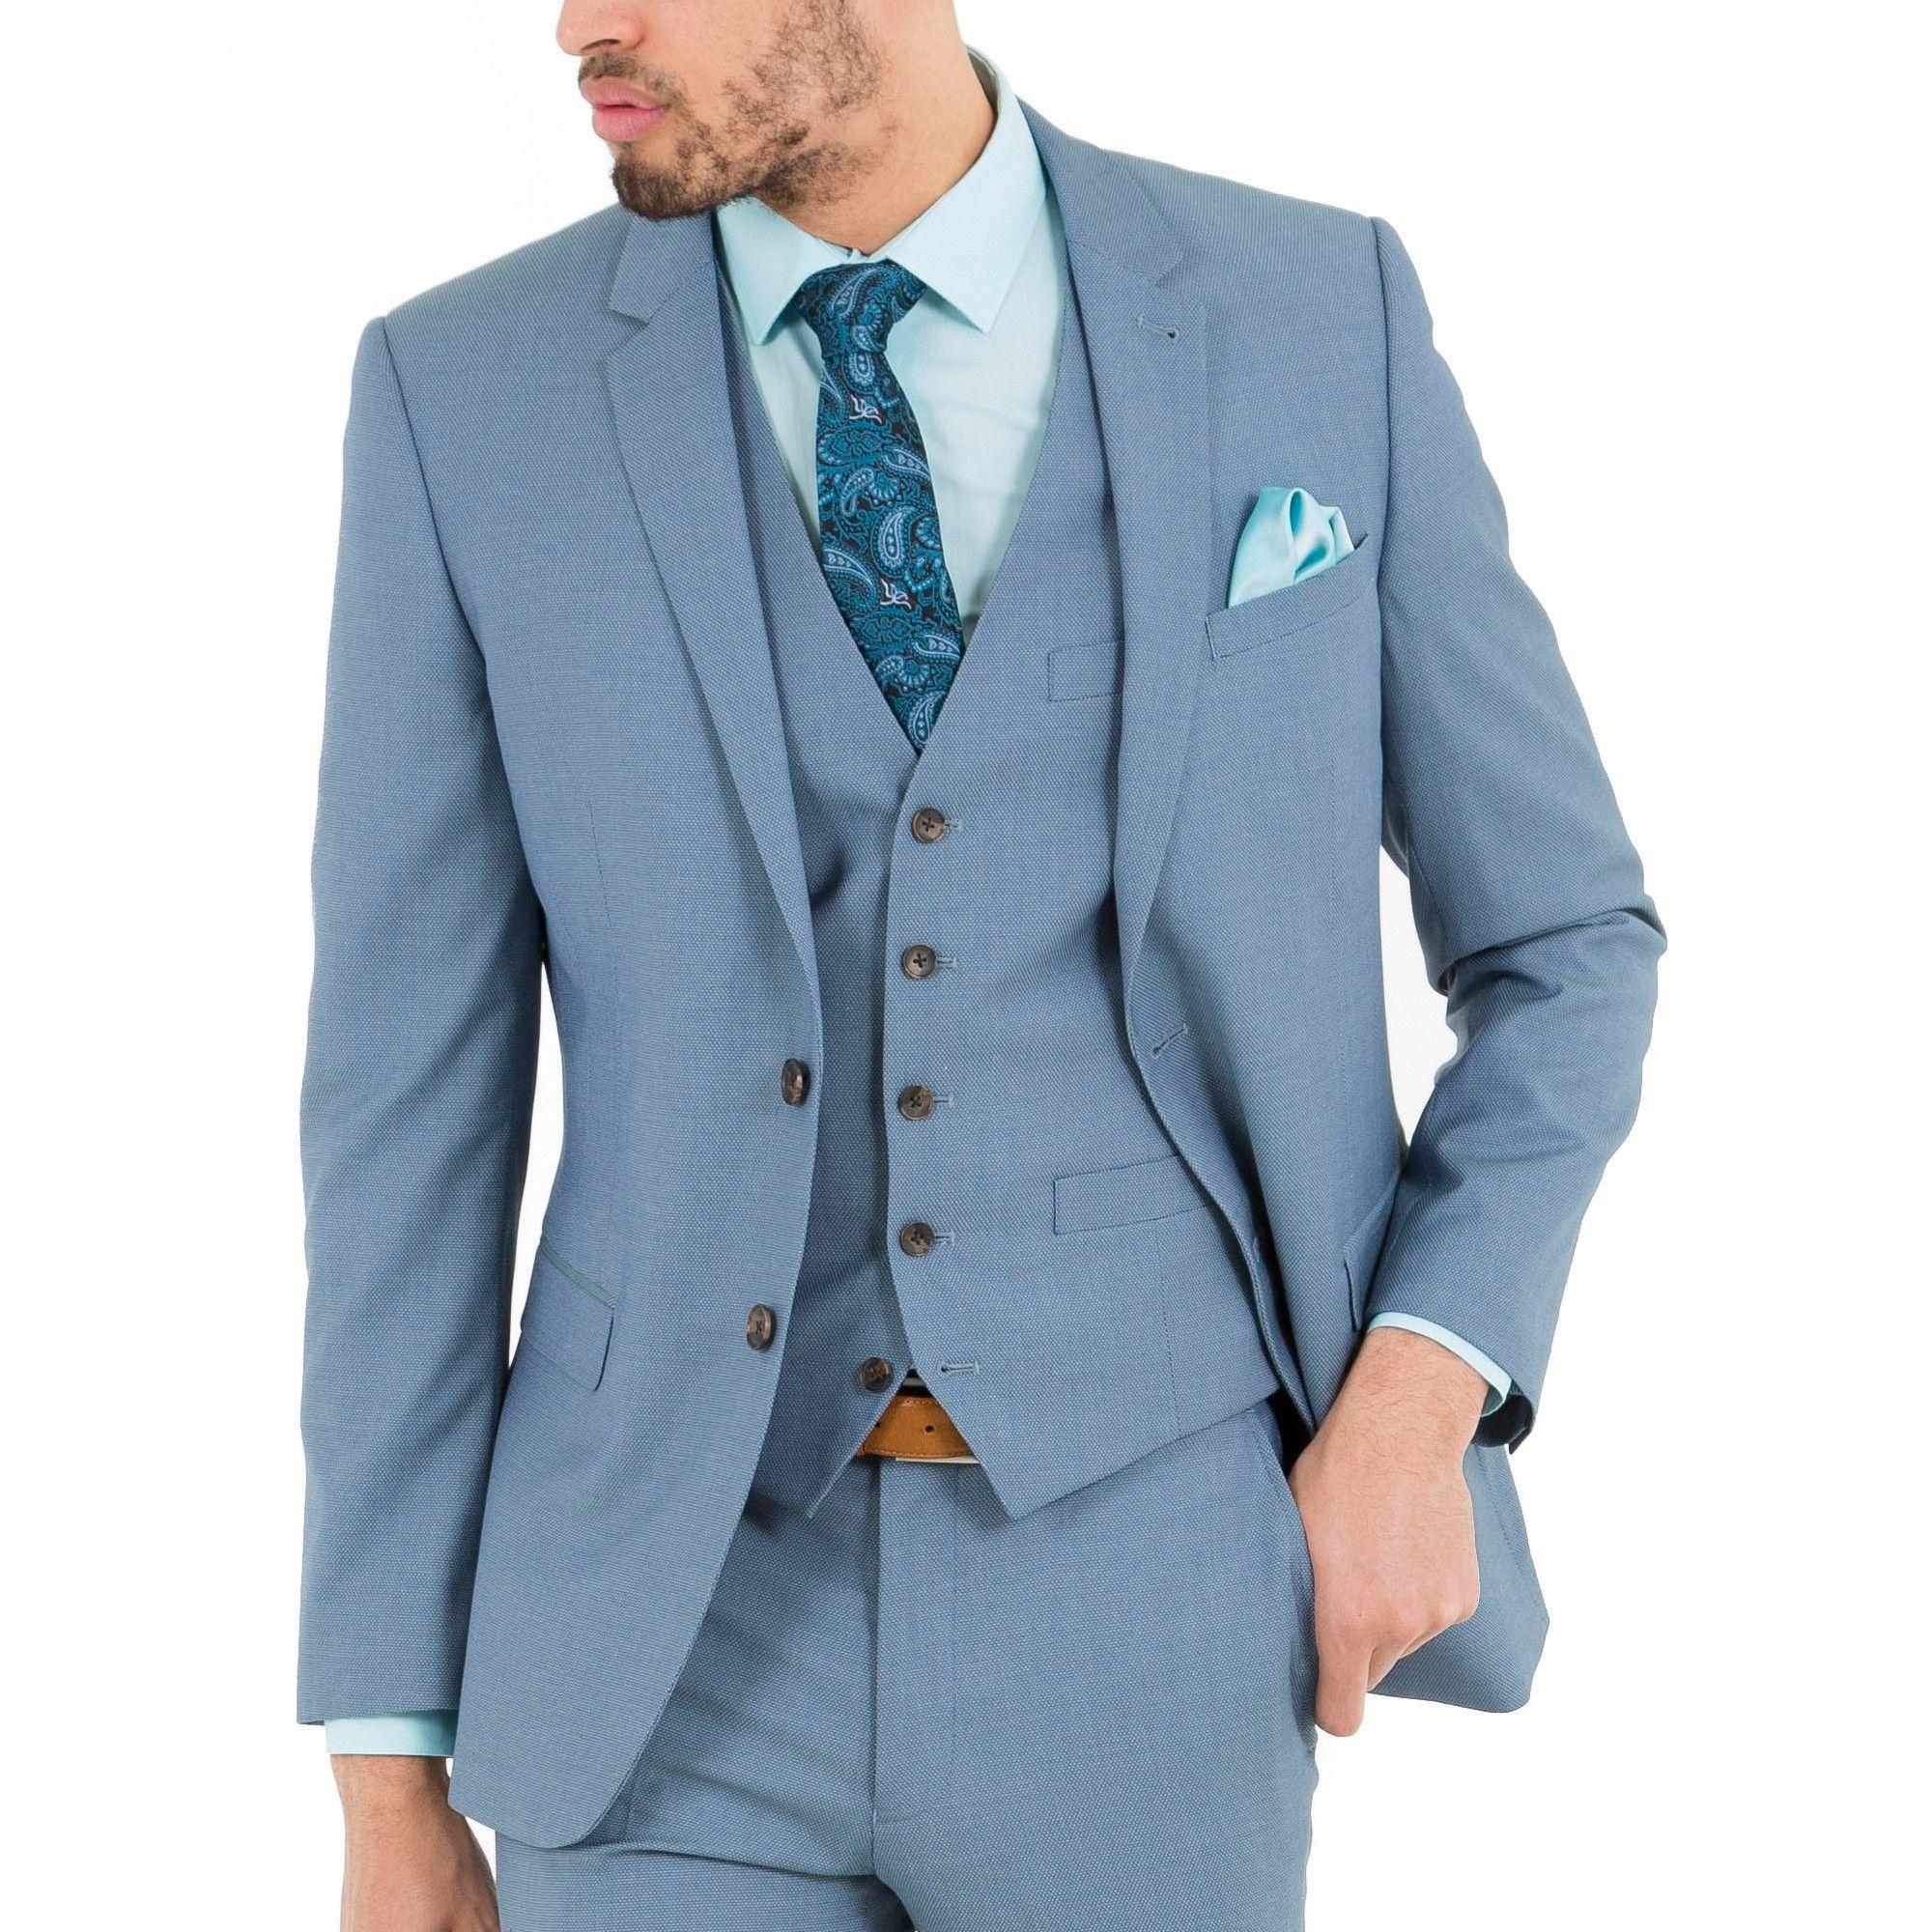 FELLINI TAILORED Light Blue Plain Tailored Three Piece Suit - Mens ...